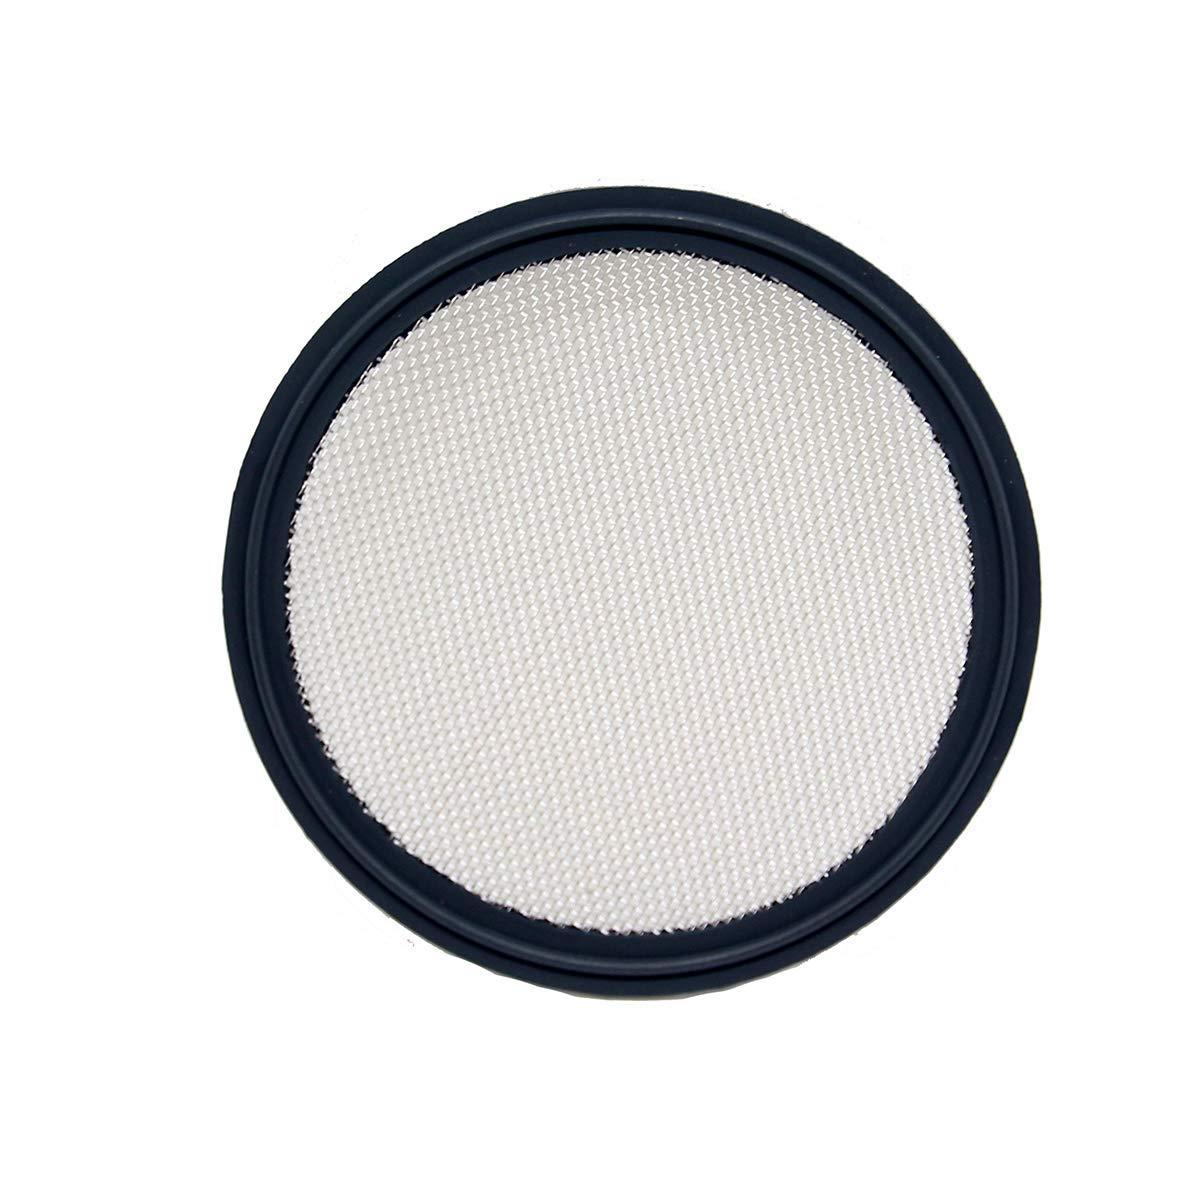 QiiMii 4 Tri-clamp Viton Sanitary Gasket with Stainless Screen 10 Mesh